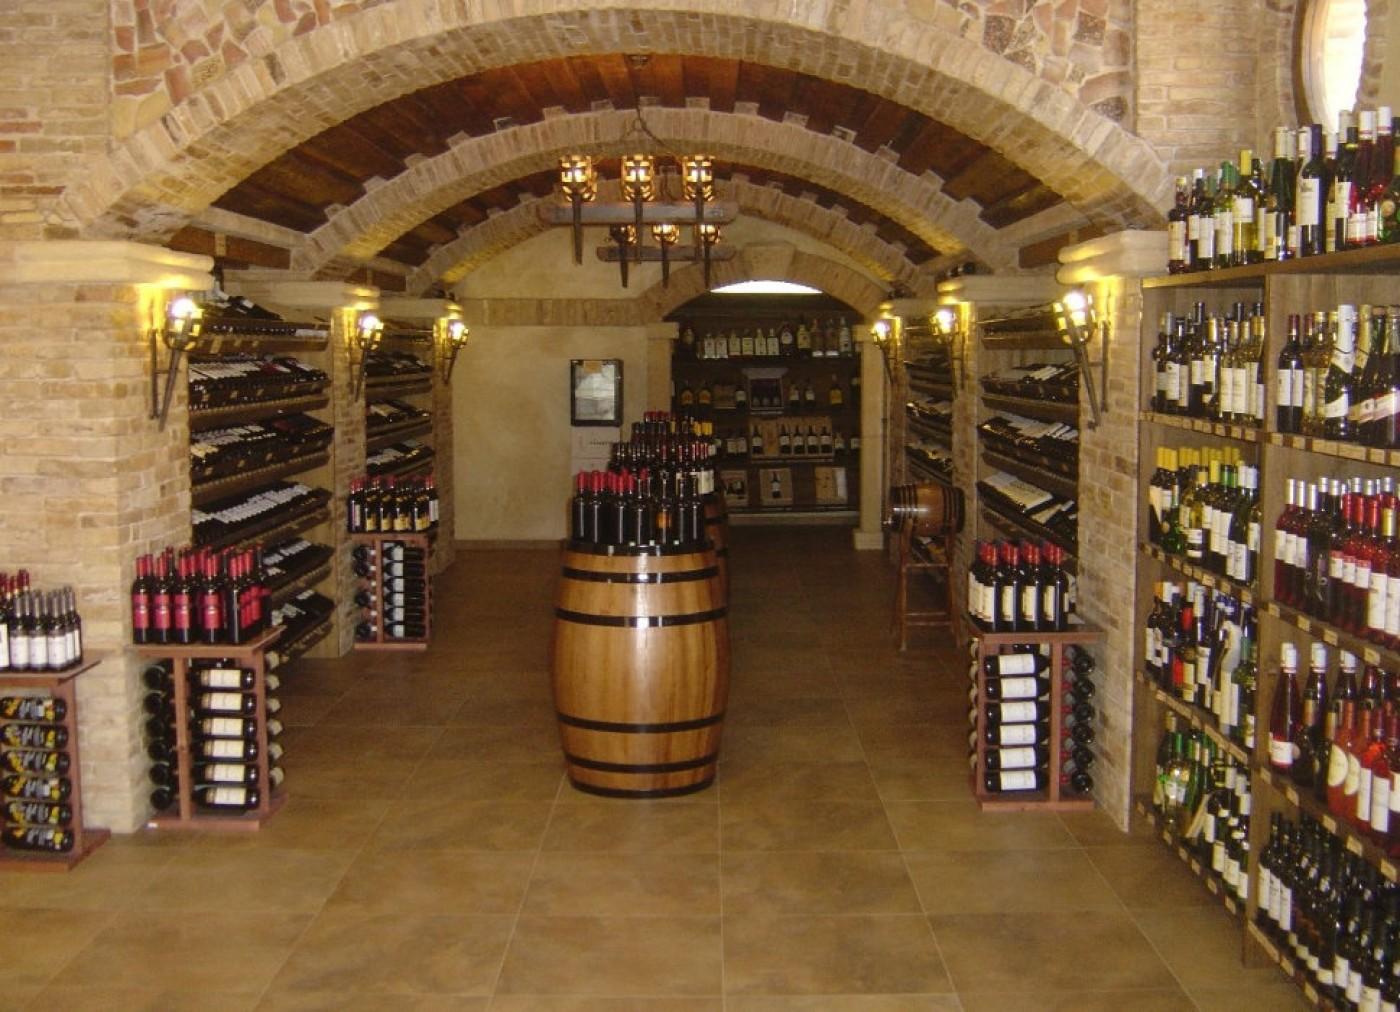 Bodega Mar Menor wine specialists in Torre Pacheco